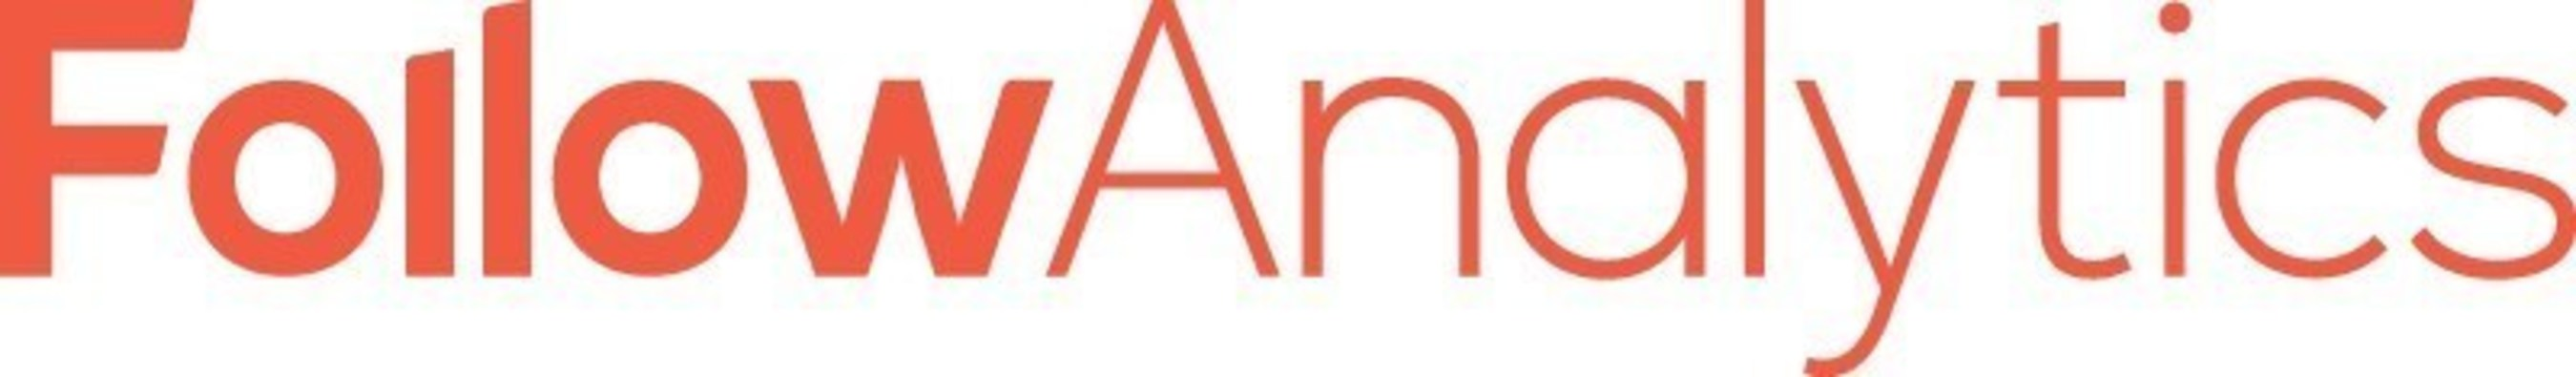 FollowAnalytics (http://www.followanalytics.com) is leading a new generation of Mobile Marketing Automation, ...